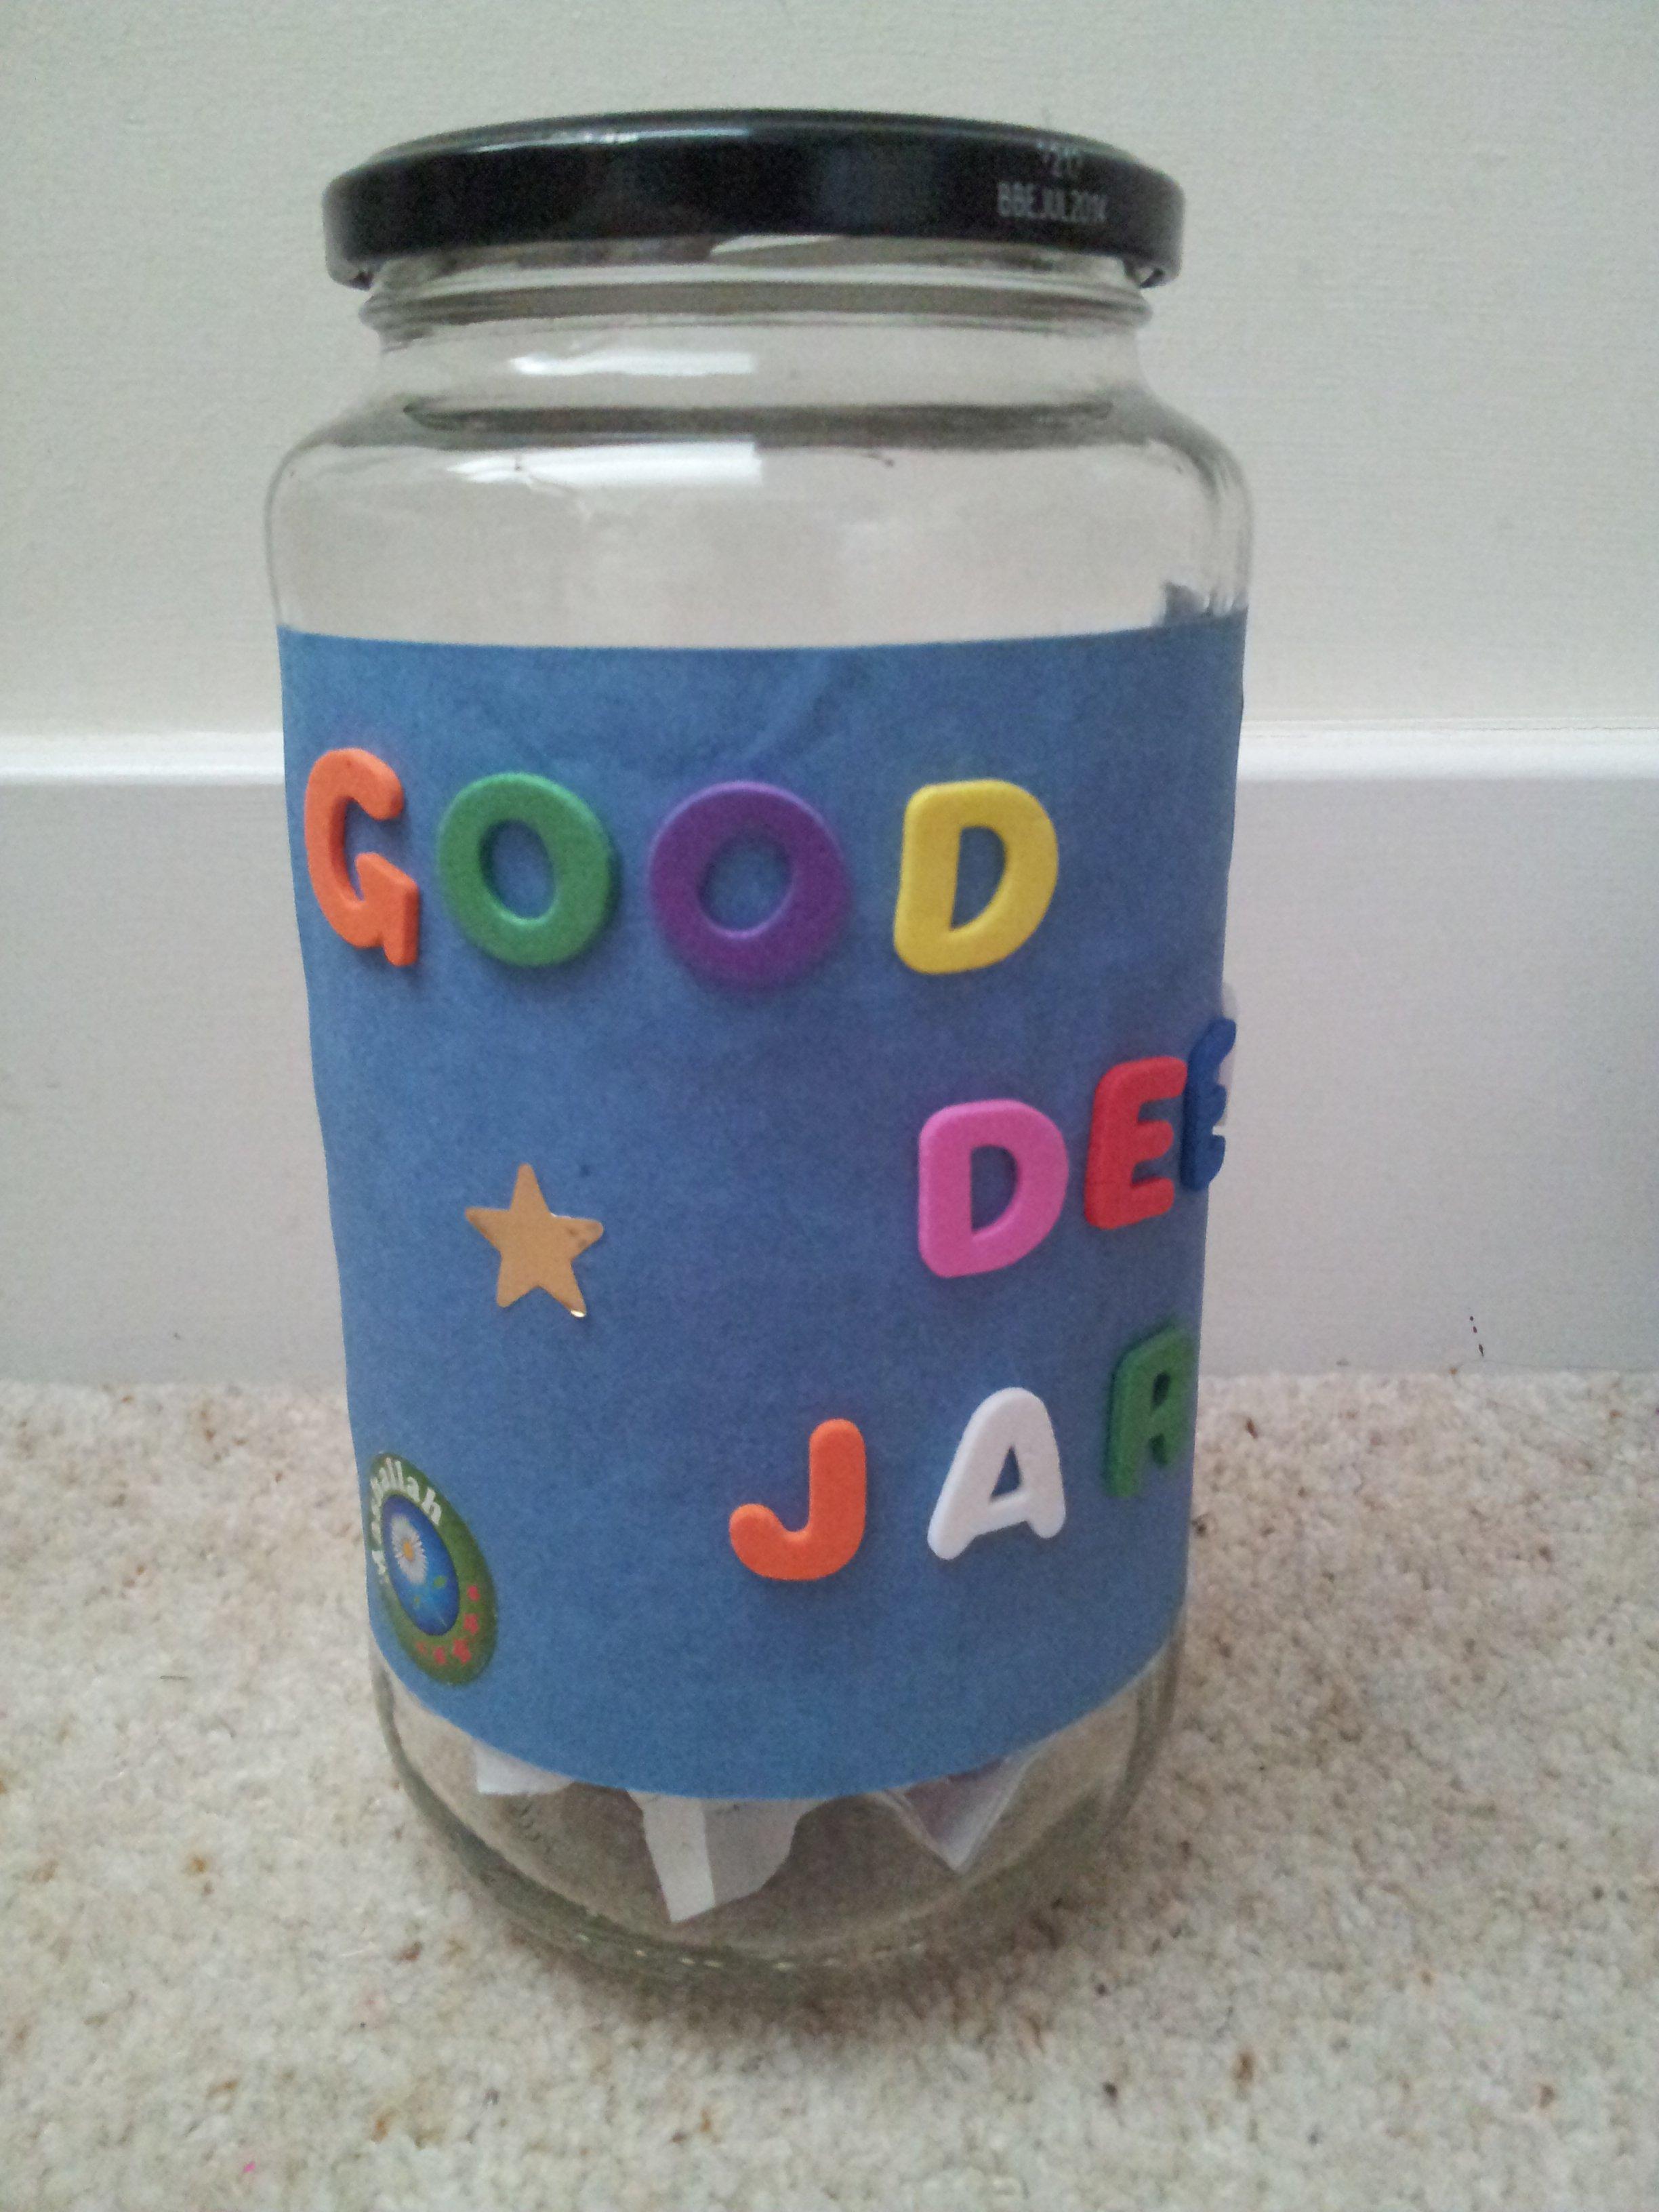 Rajab Idea 5: A Good Deed Jar